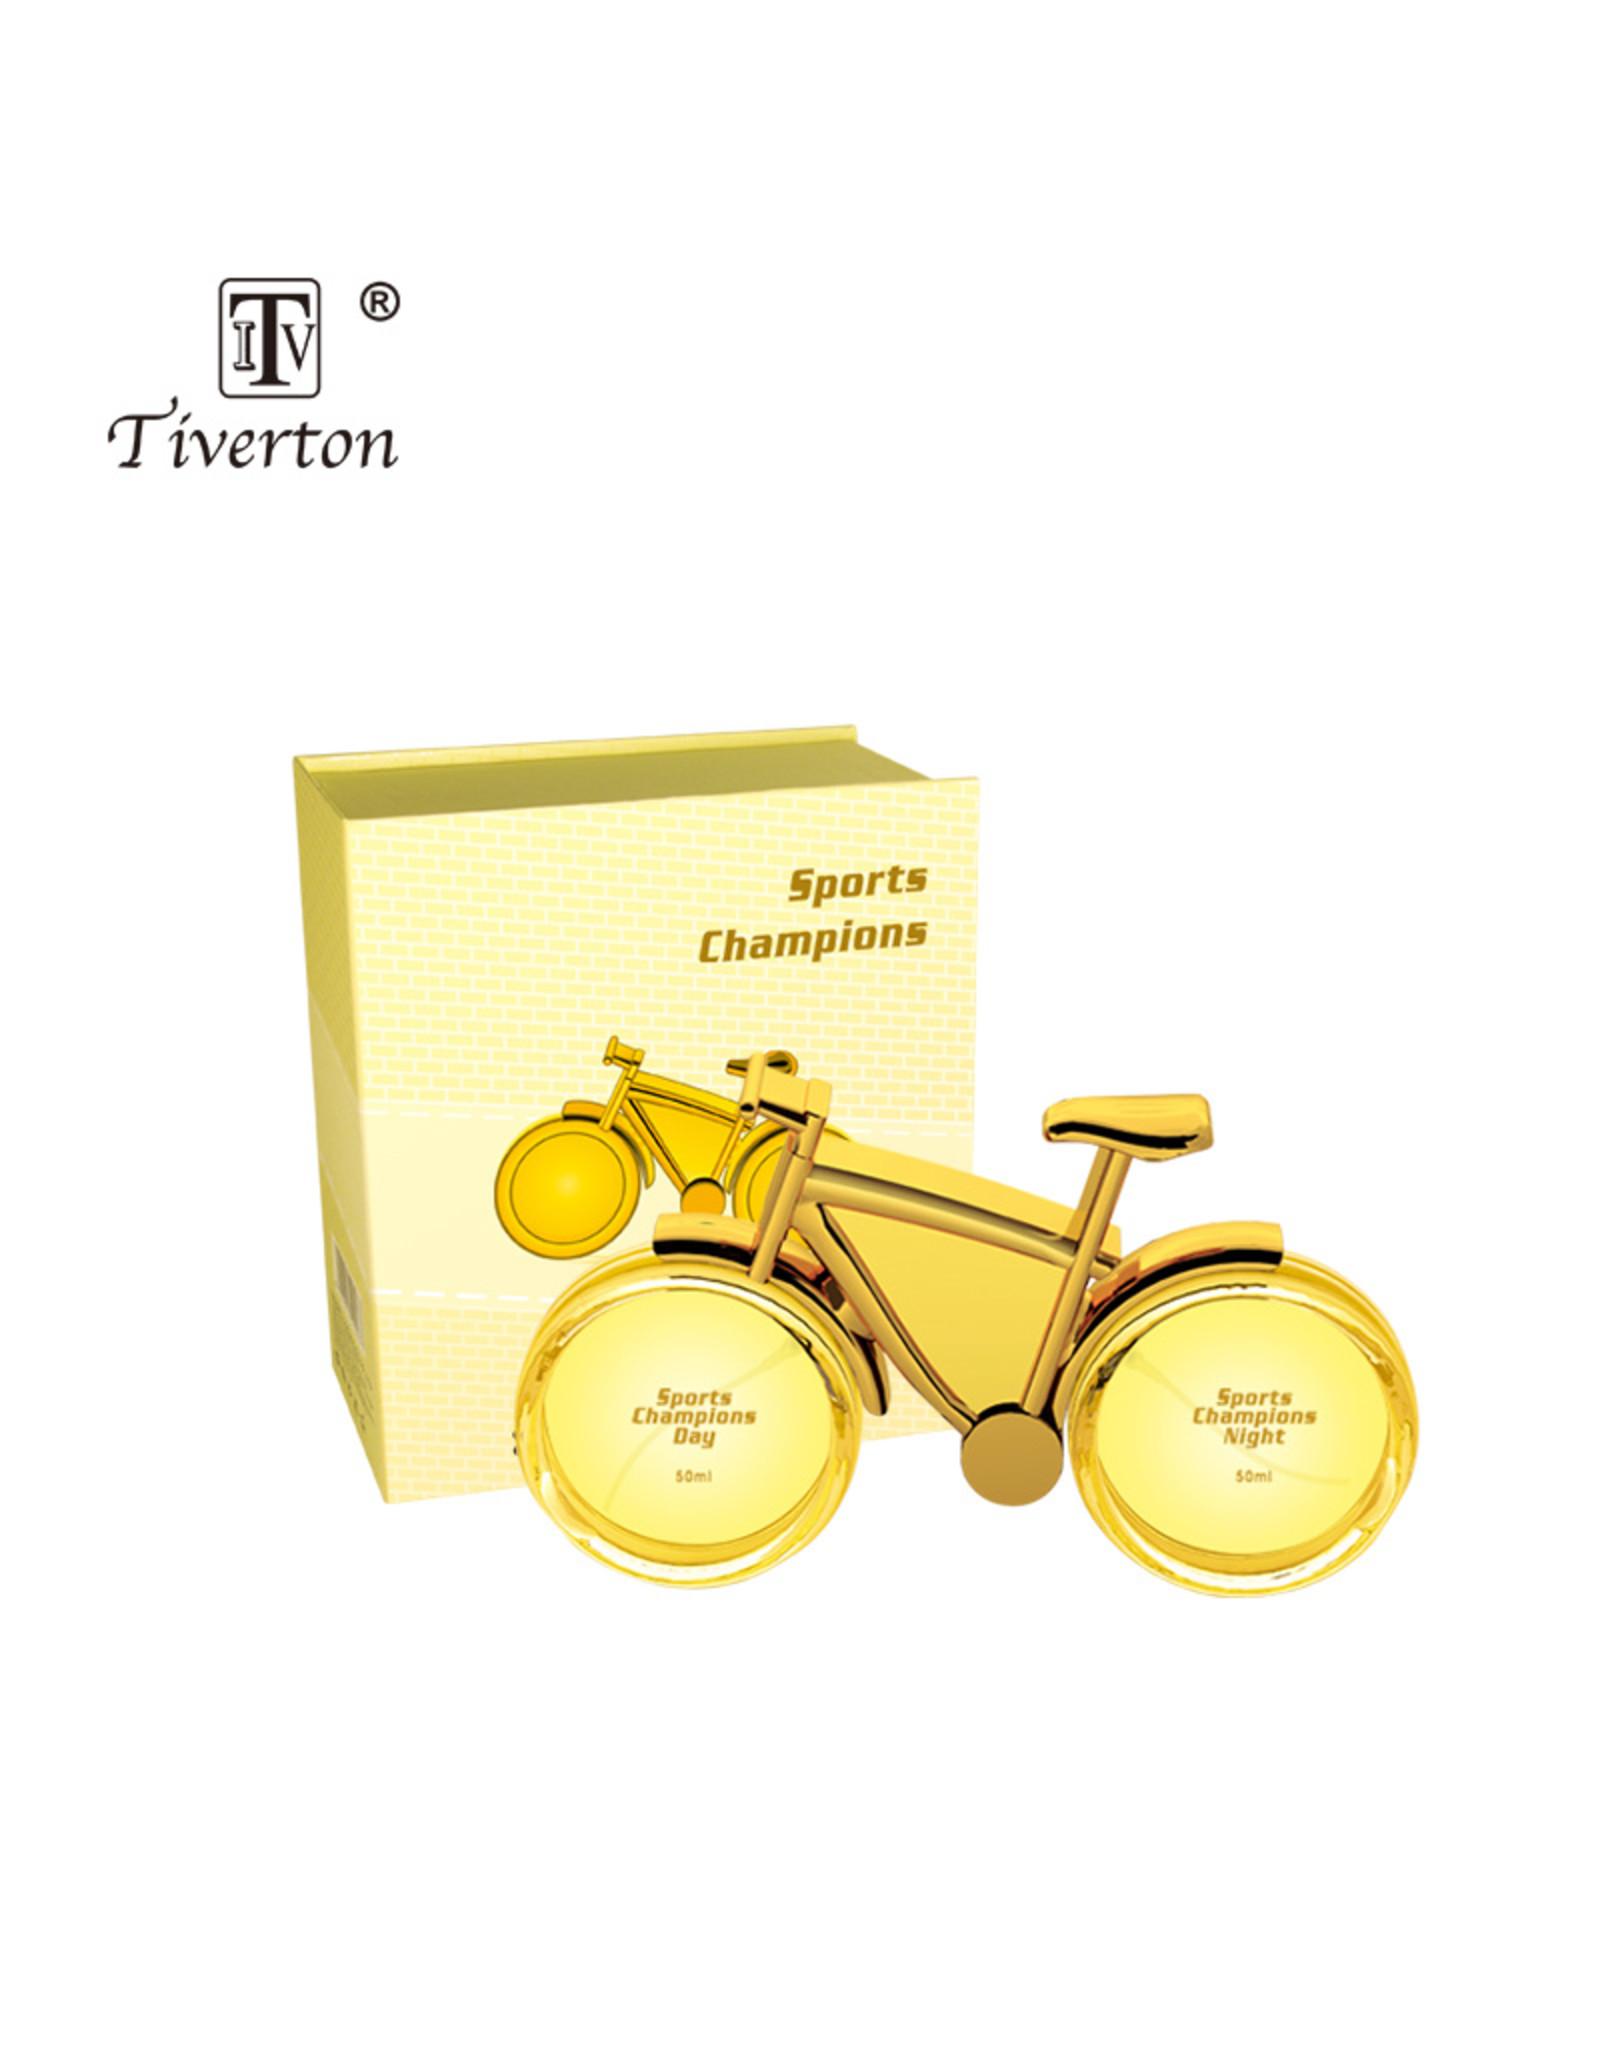 Tiverton Sports Champions 100 ml EDP women